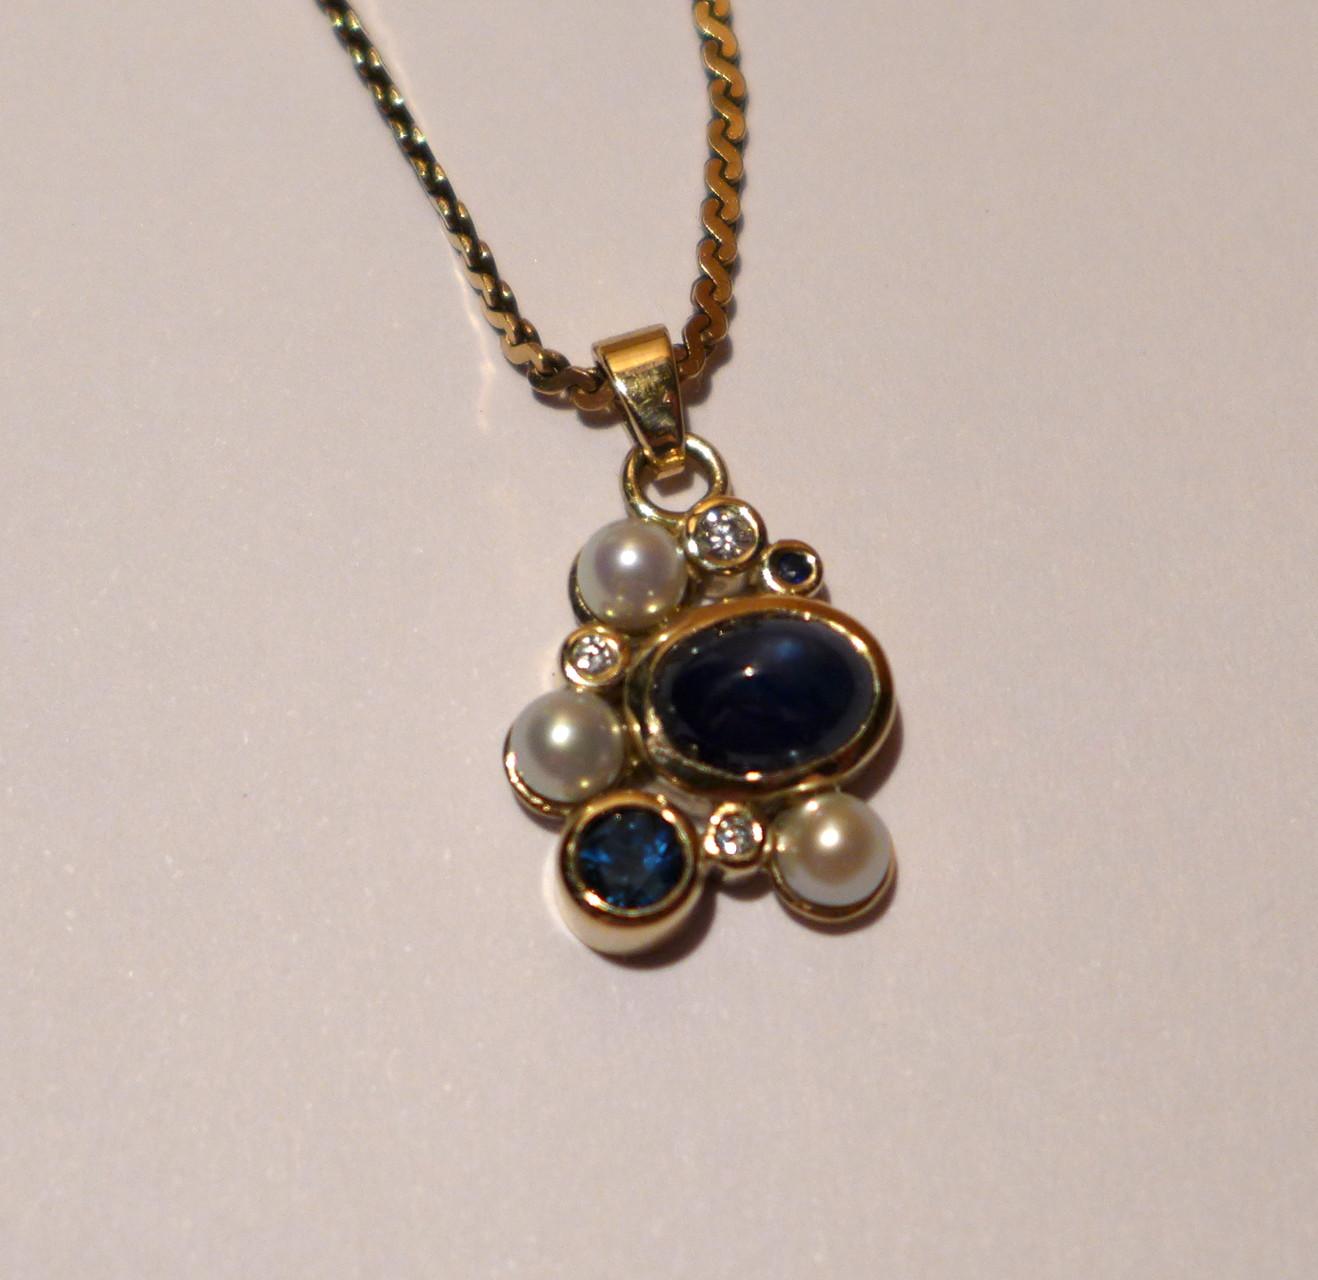 Pendant, 14k yellow gold, sapphires, diamonds, freshwater pearls